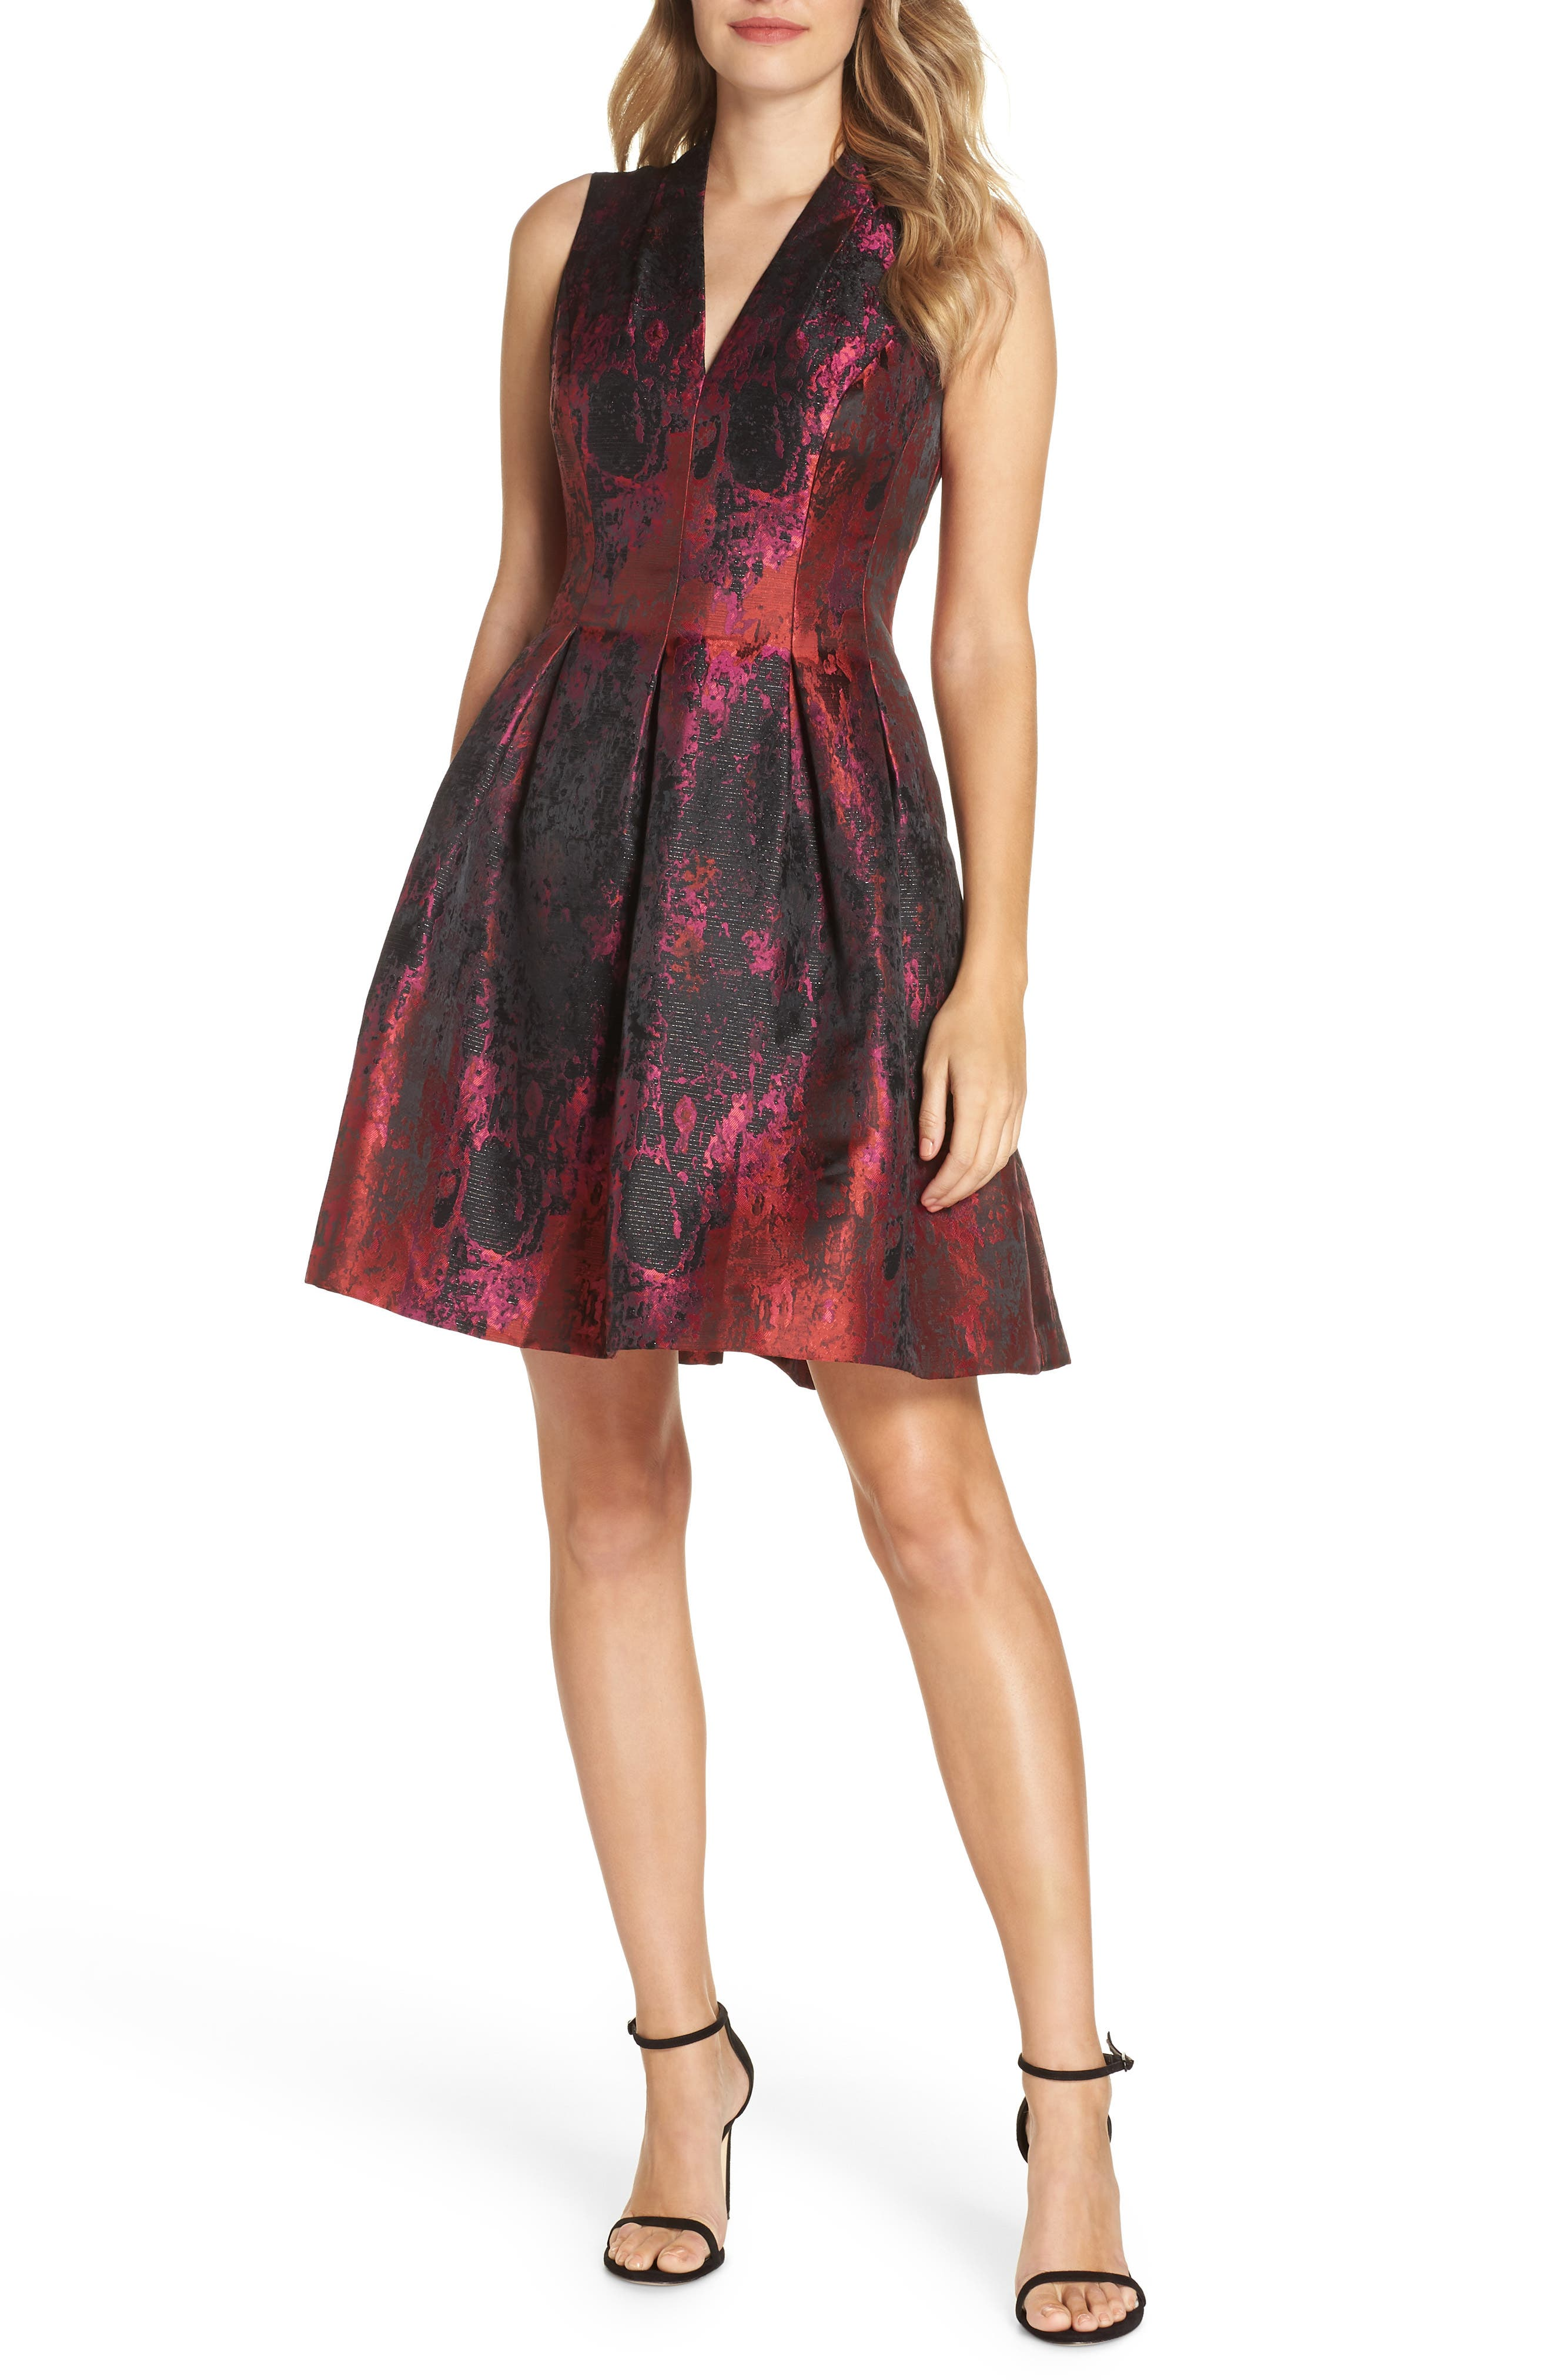 VINCE CAMUTO Jacquard Fit & Flare Dress, Main, color, 653